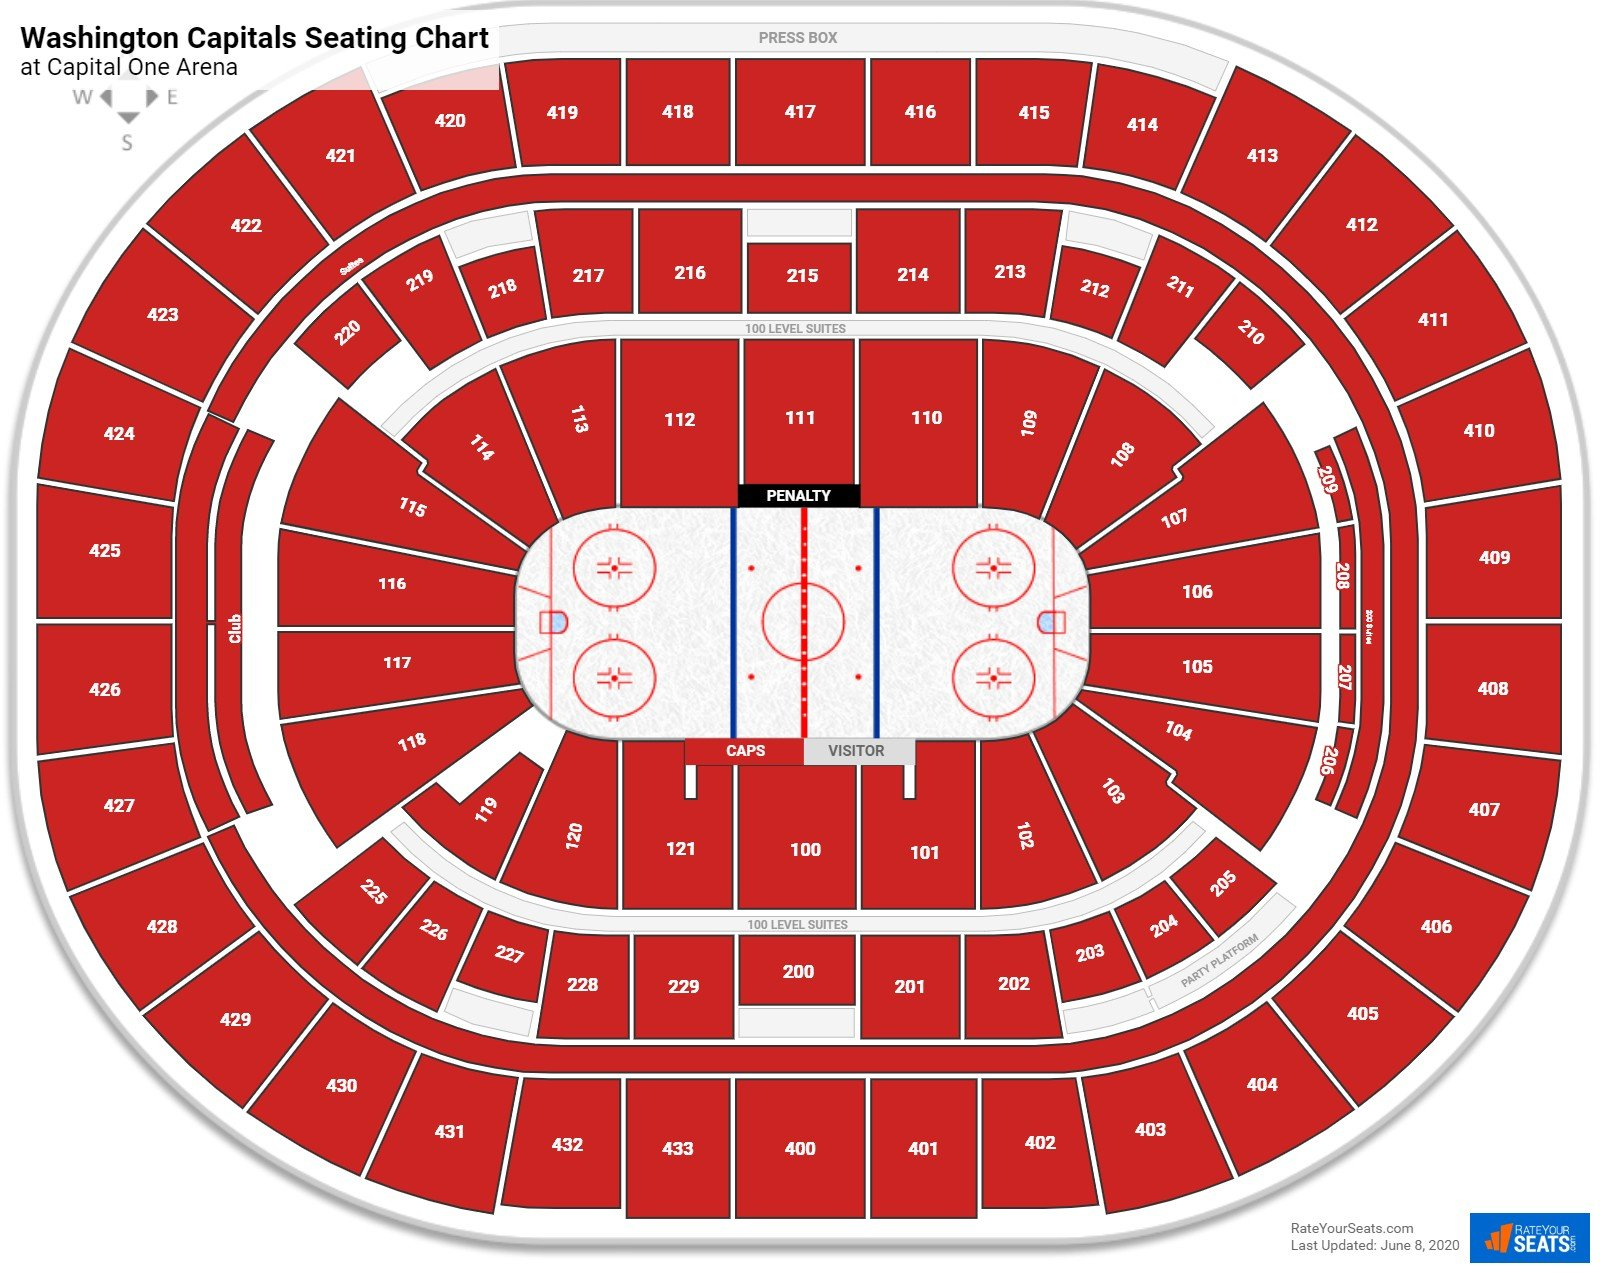 Washington Capitals Seating Charts At Capital One Arena Rateyourseats Com